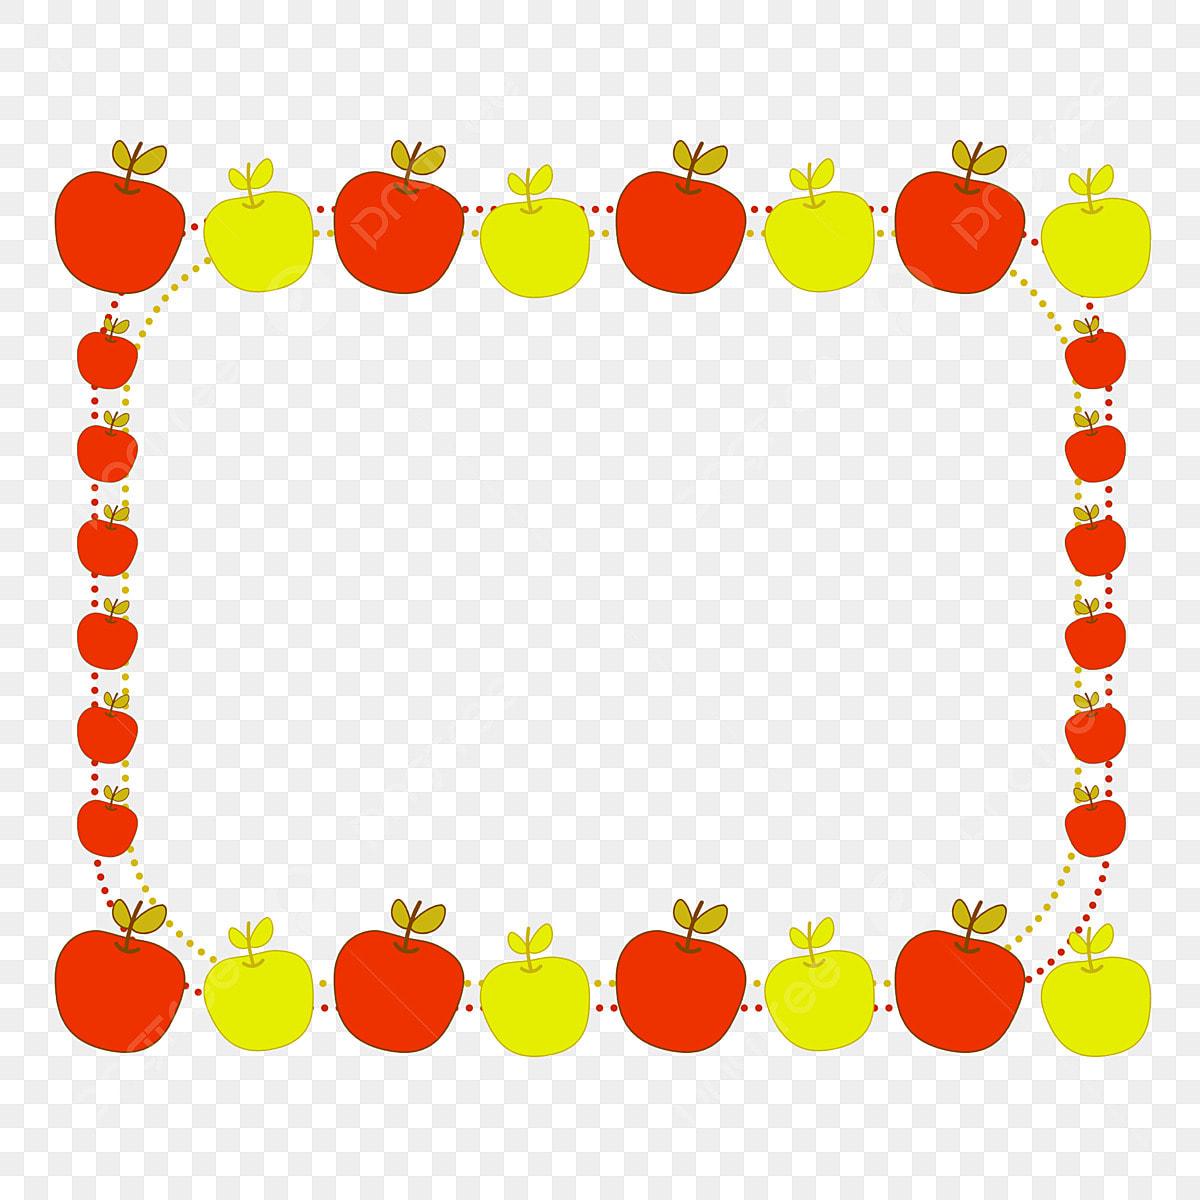 Apple Fruit Cartoon Border Border Fruit Apple Png Transparent Clipart Image And Psd File For Free Download